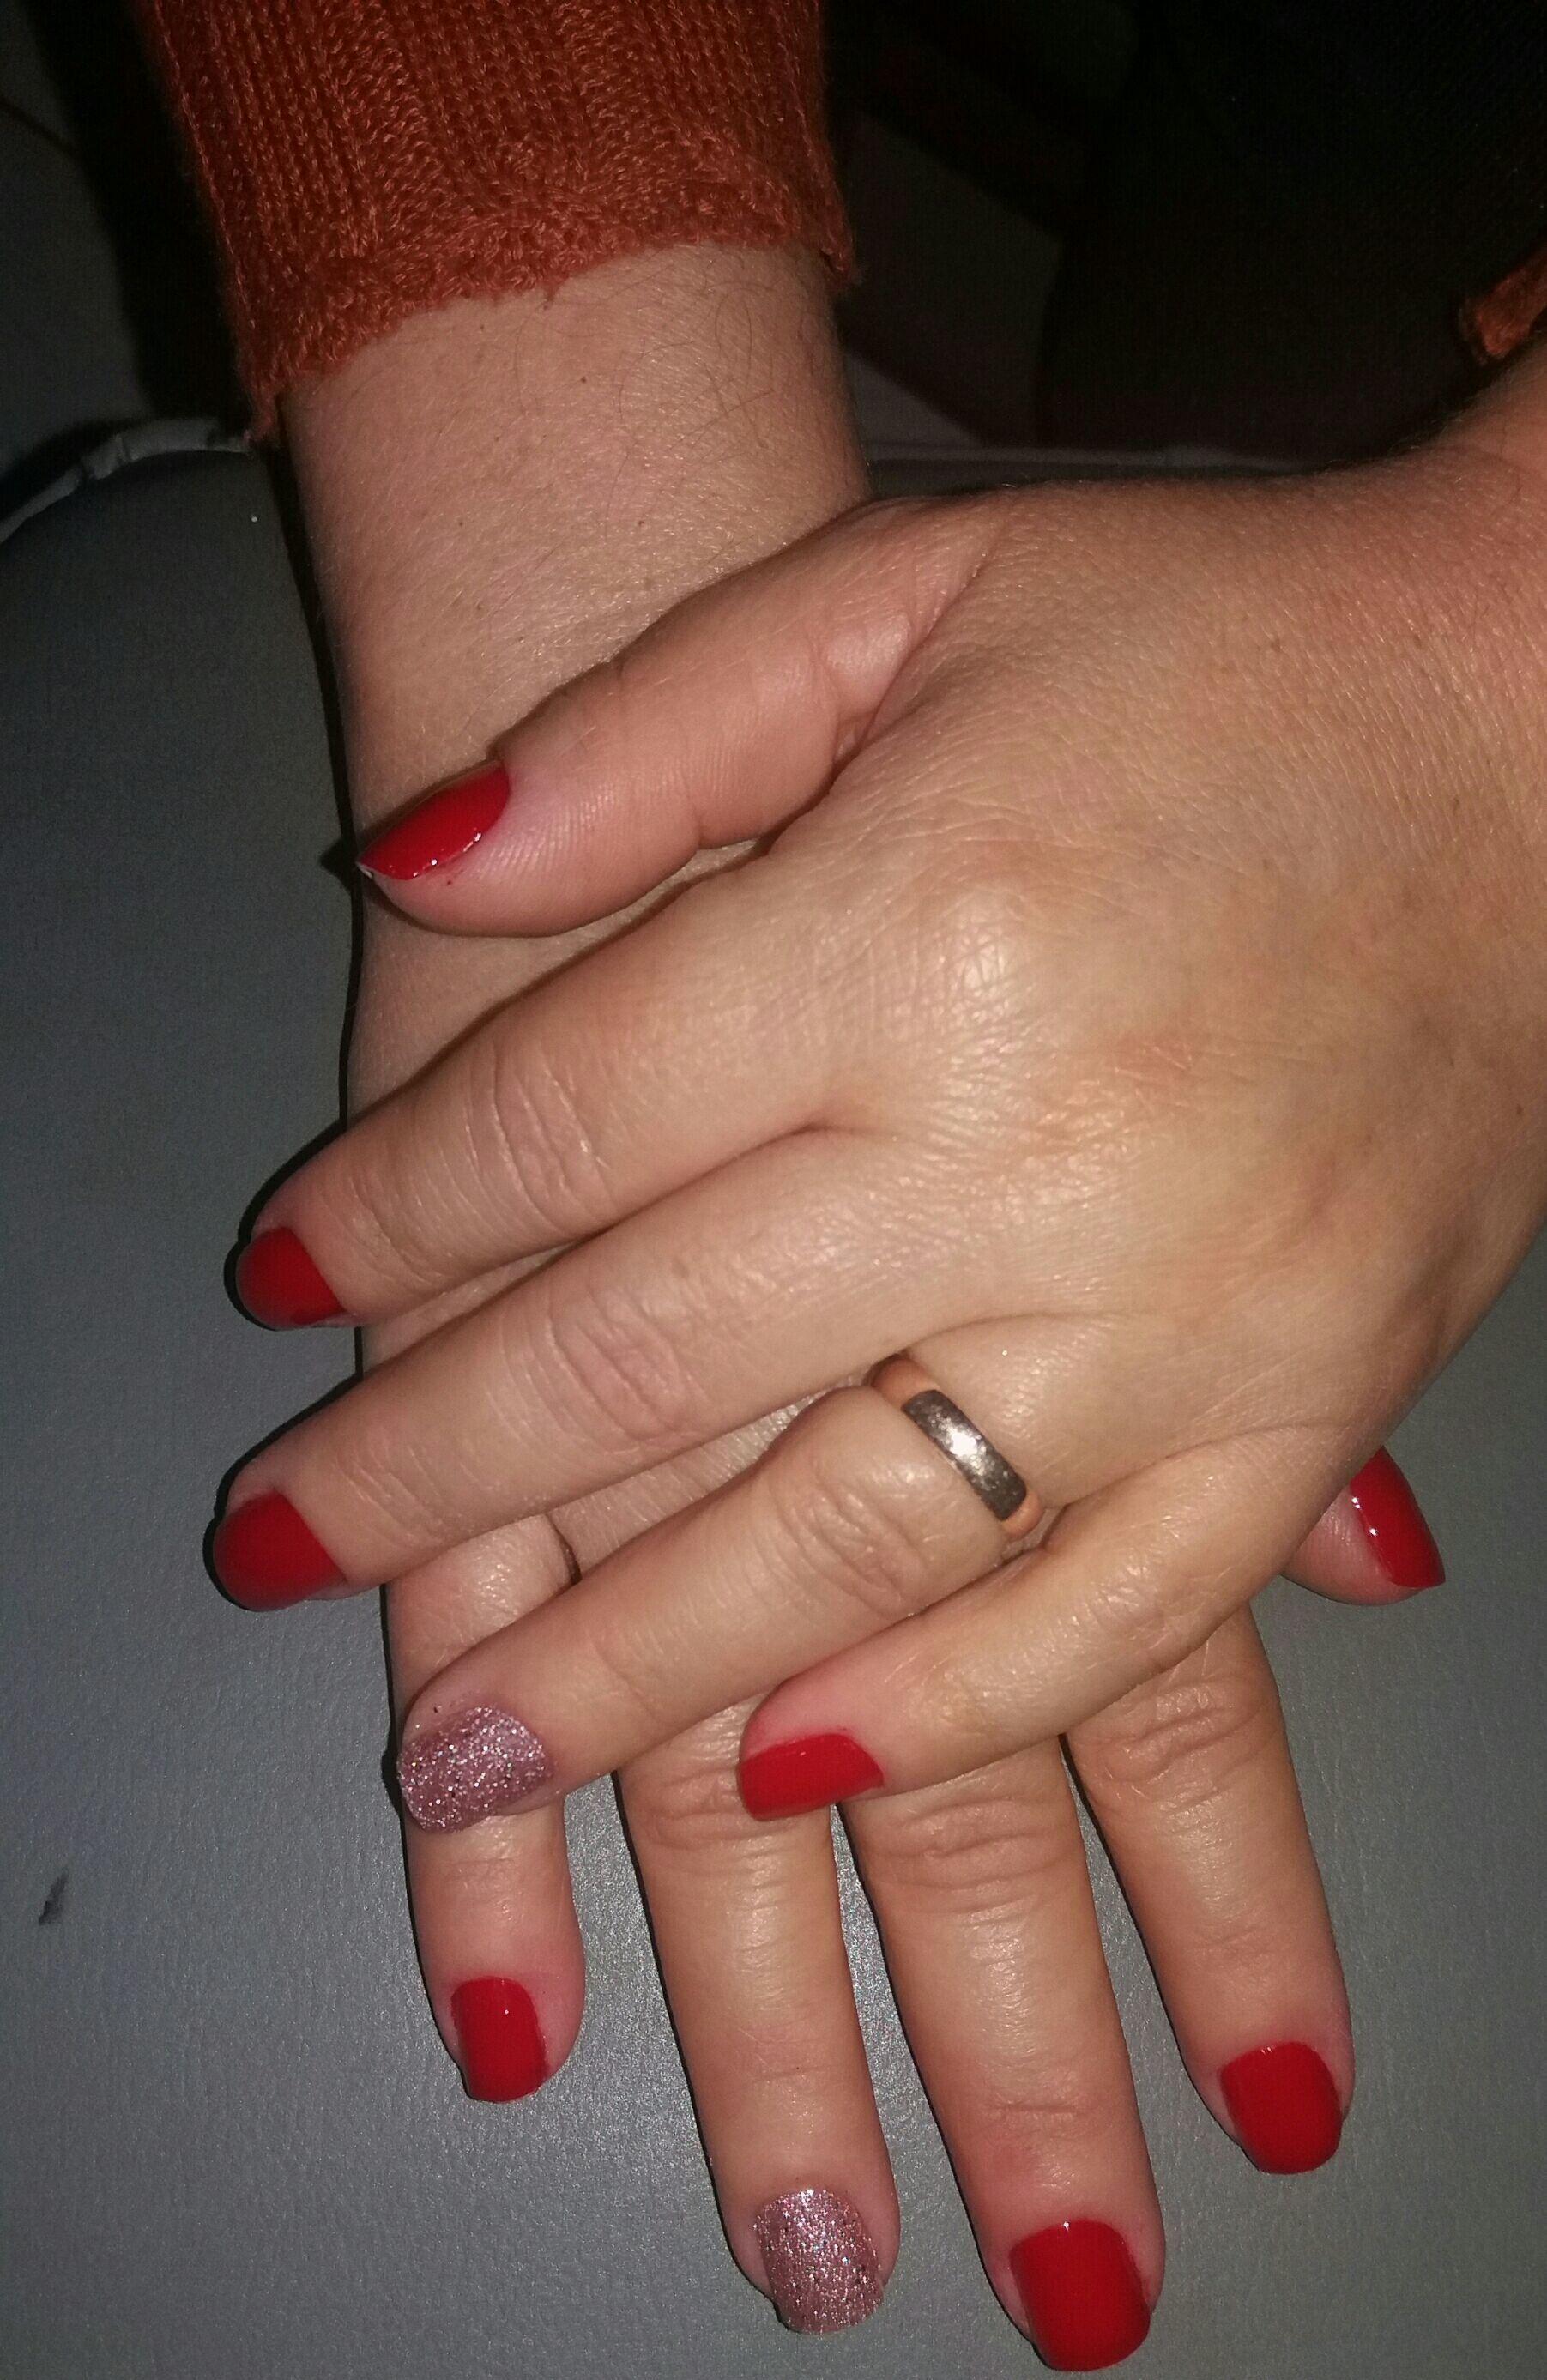 Amo deixa minhas cliente lindas unha depilador(a) manicure e pedicure manicure e pedicure